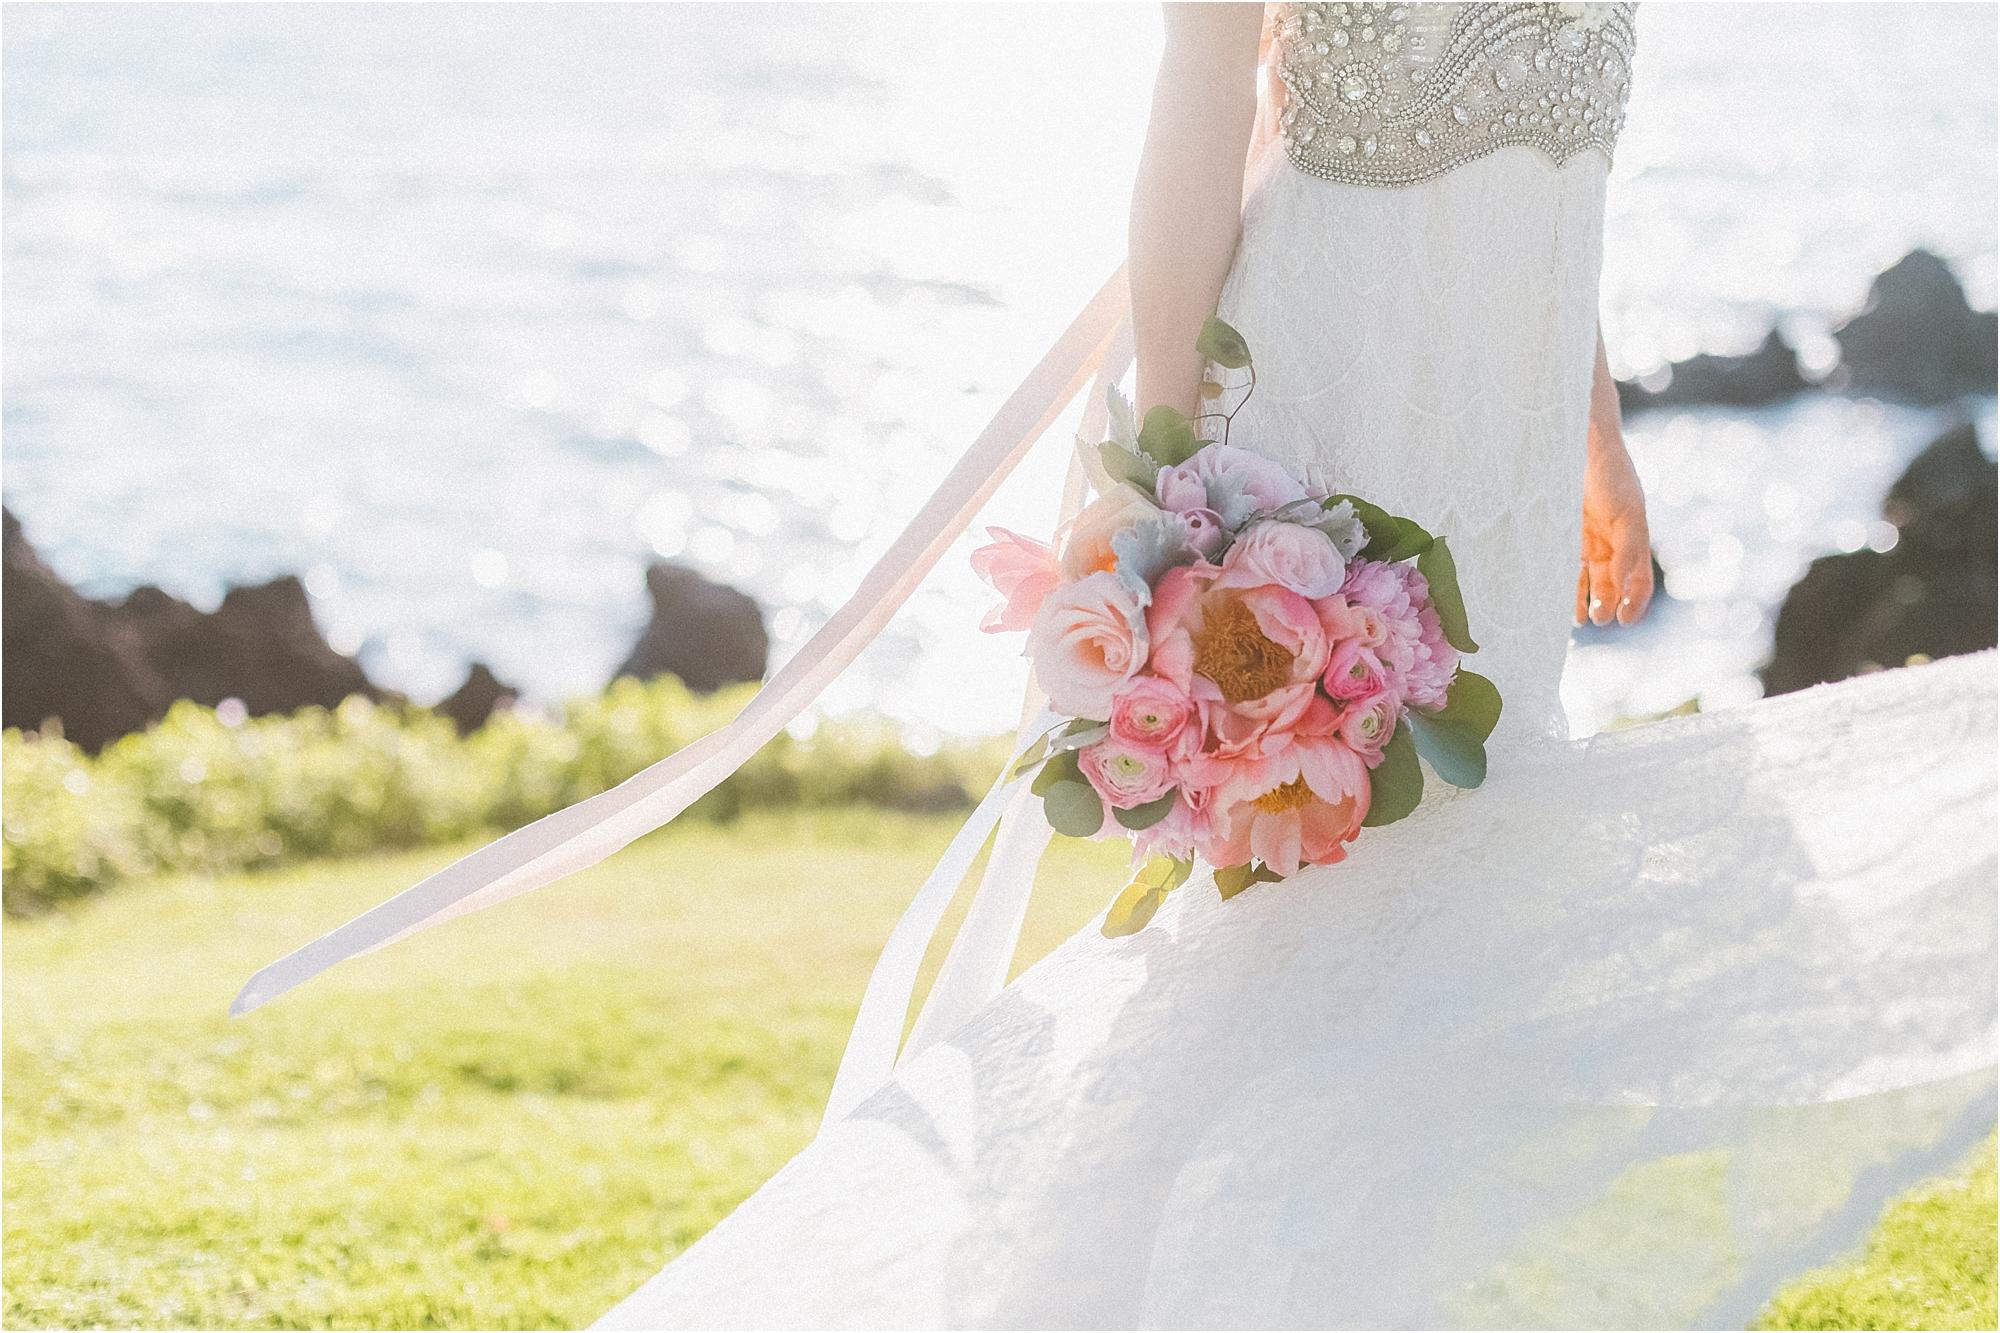 angie-diaz-photography-maui-hawaii-destination-wedding-makena-golf-beach-club_0043.jpg